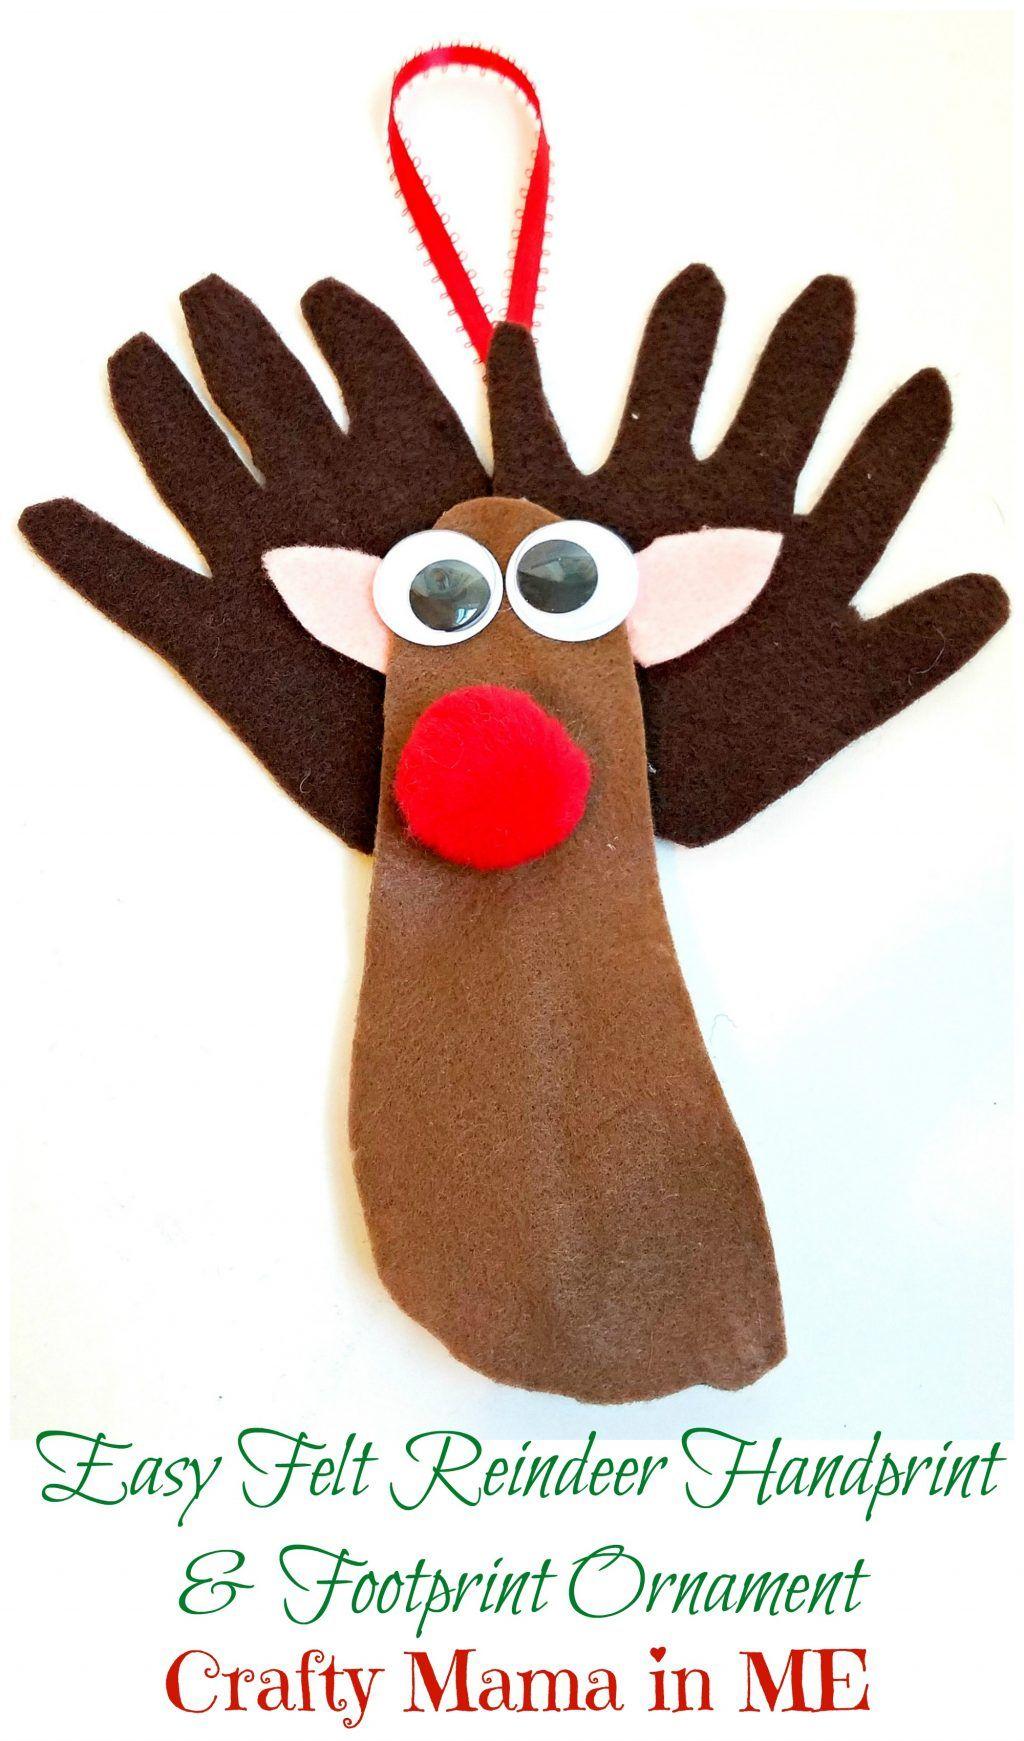 Easy Felt Reindeer Handprint And Footprint Ornament Crafty Mama In Me Reindeer Handprint Handprint Ornaments Christmas Ornaments To Make